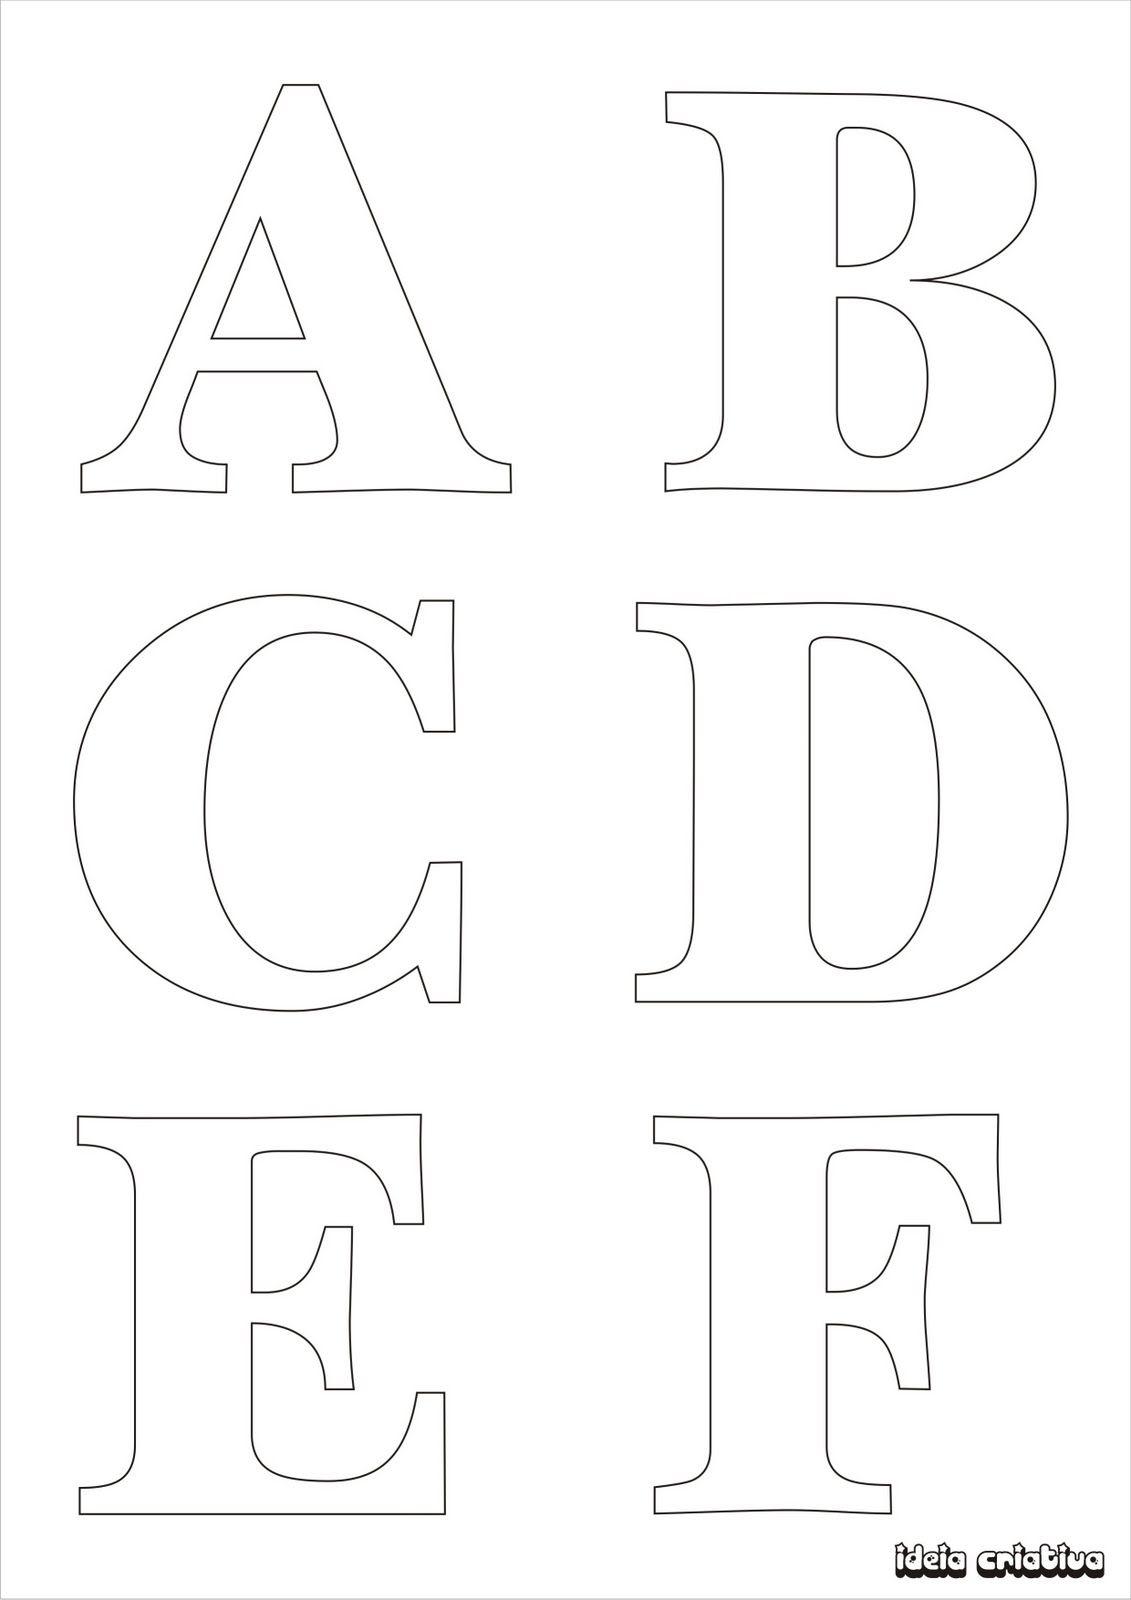 Letras para imprimir mayusculas buscar con google for Mobel 9 buchstaben